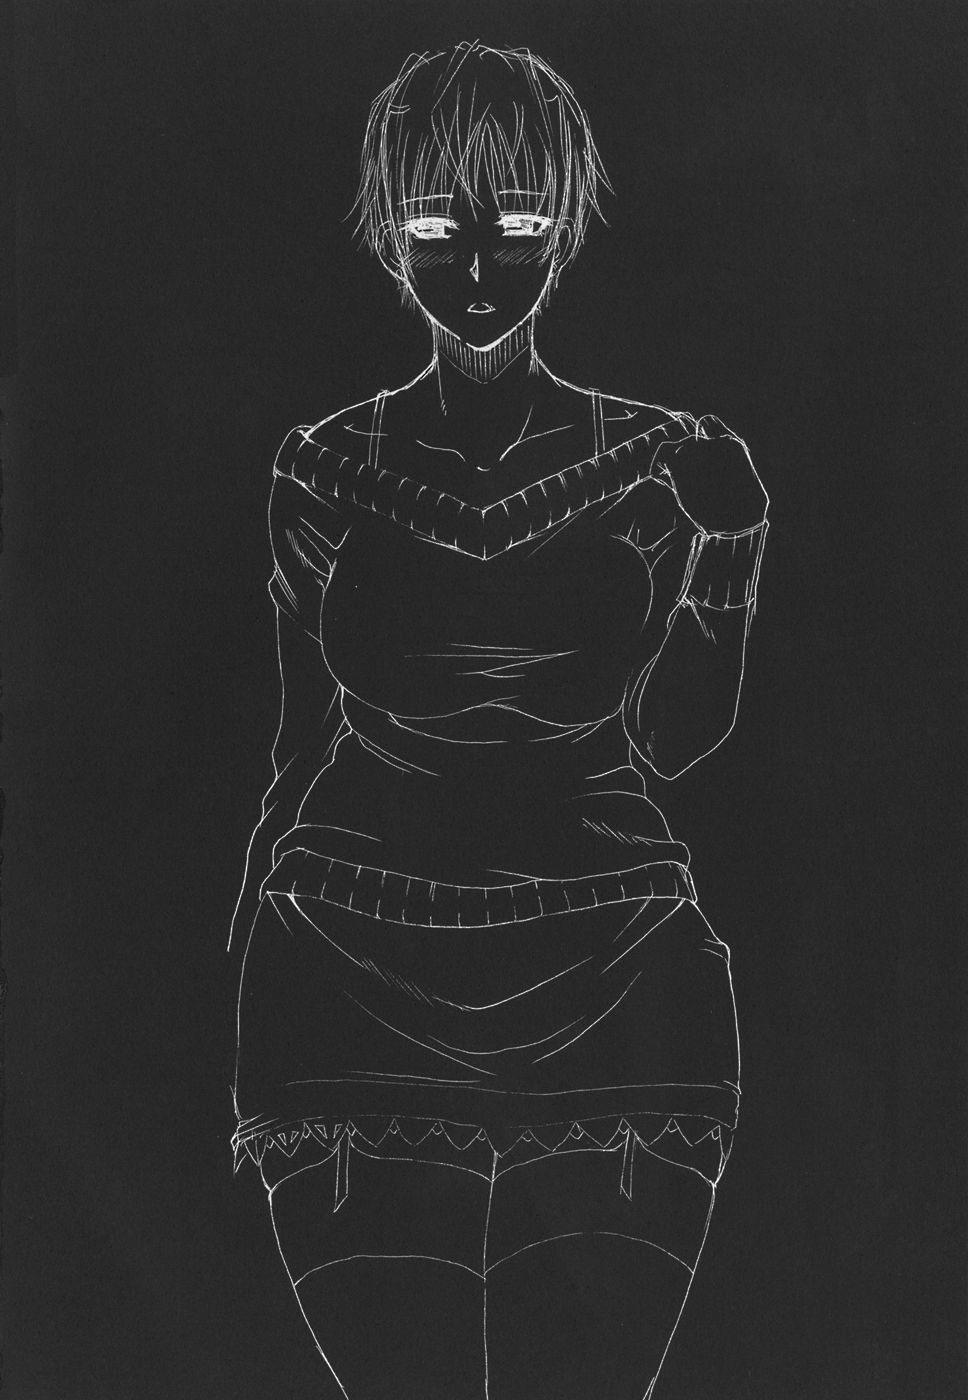 Ichizu na Toriko - A Earnest Captive 192